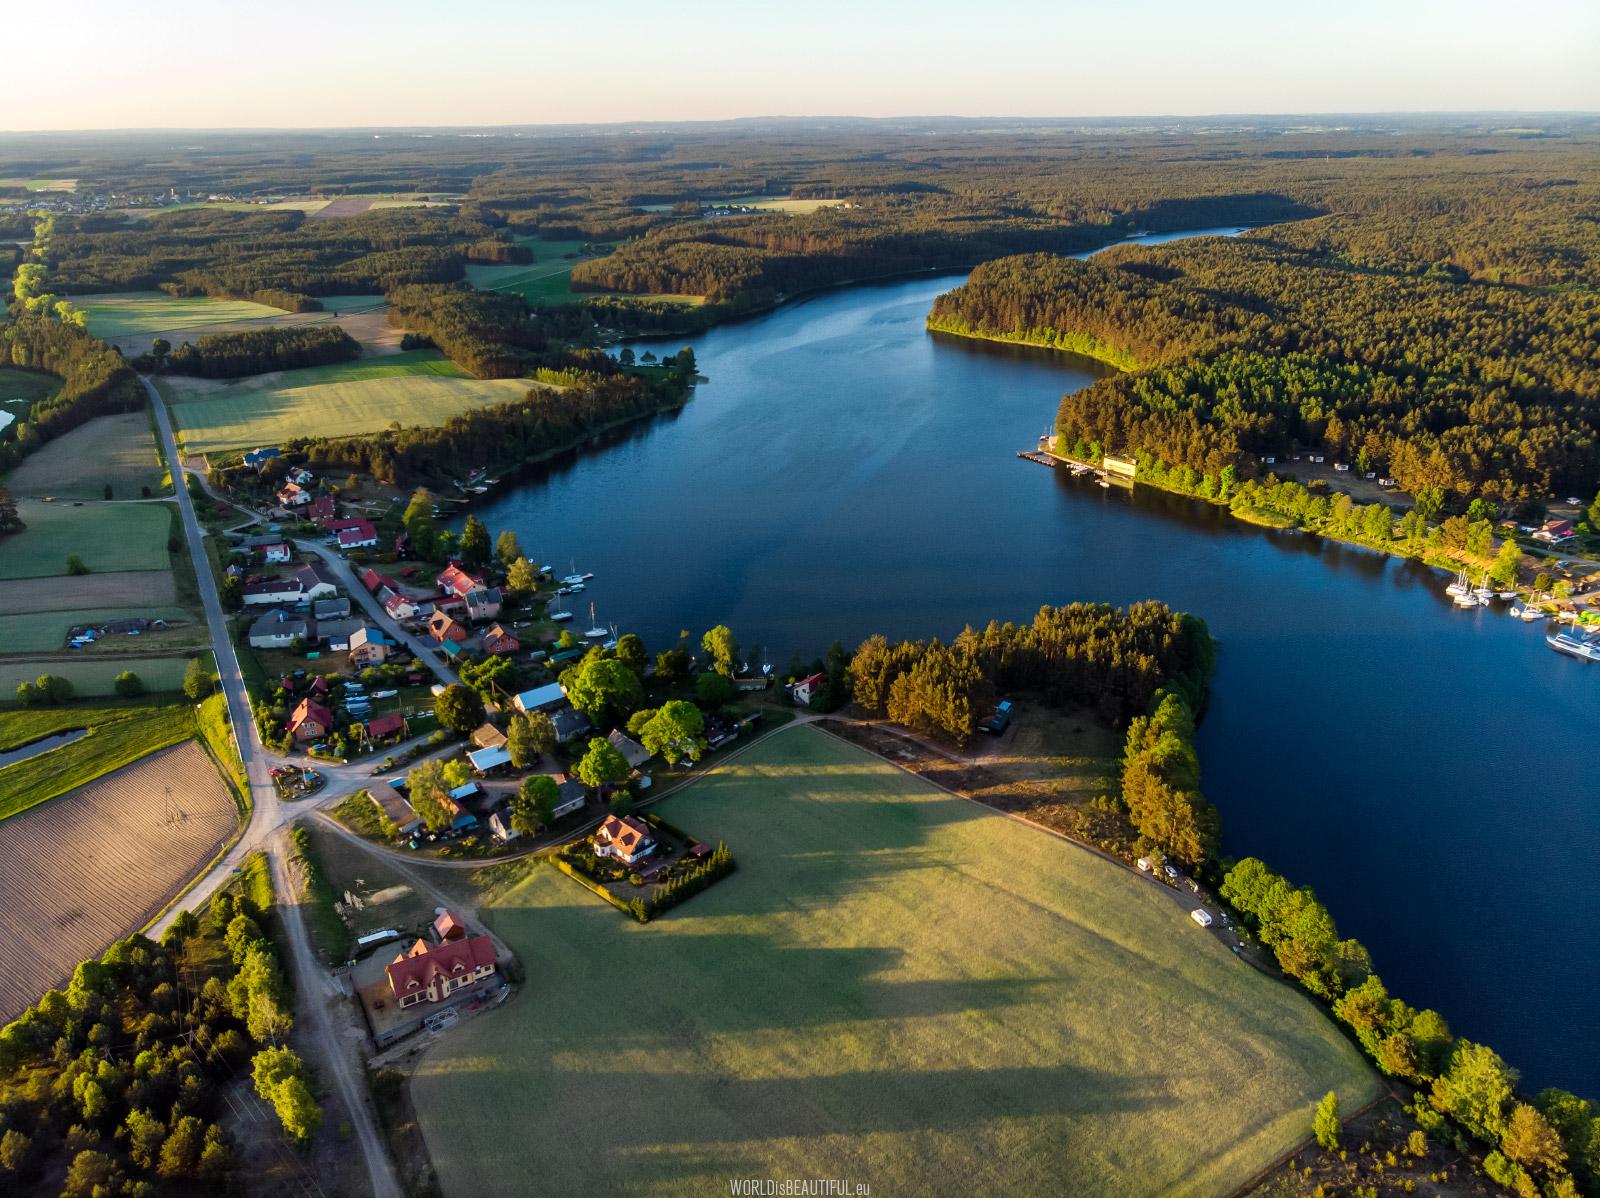 Jezioro Jelenie (Deer Lake) and Czarlina